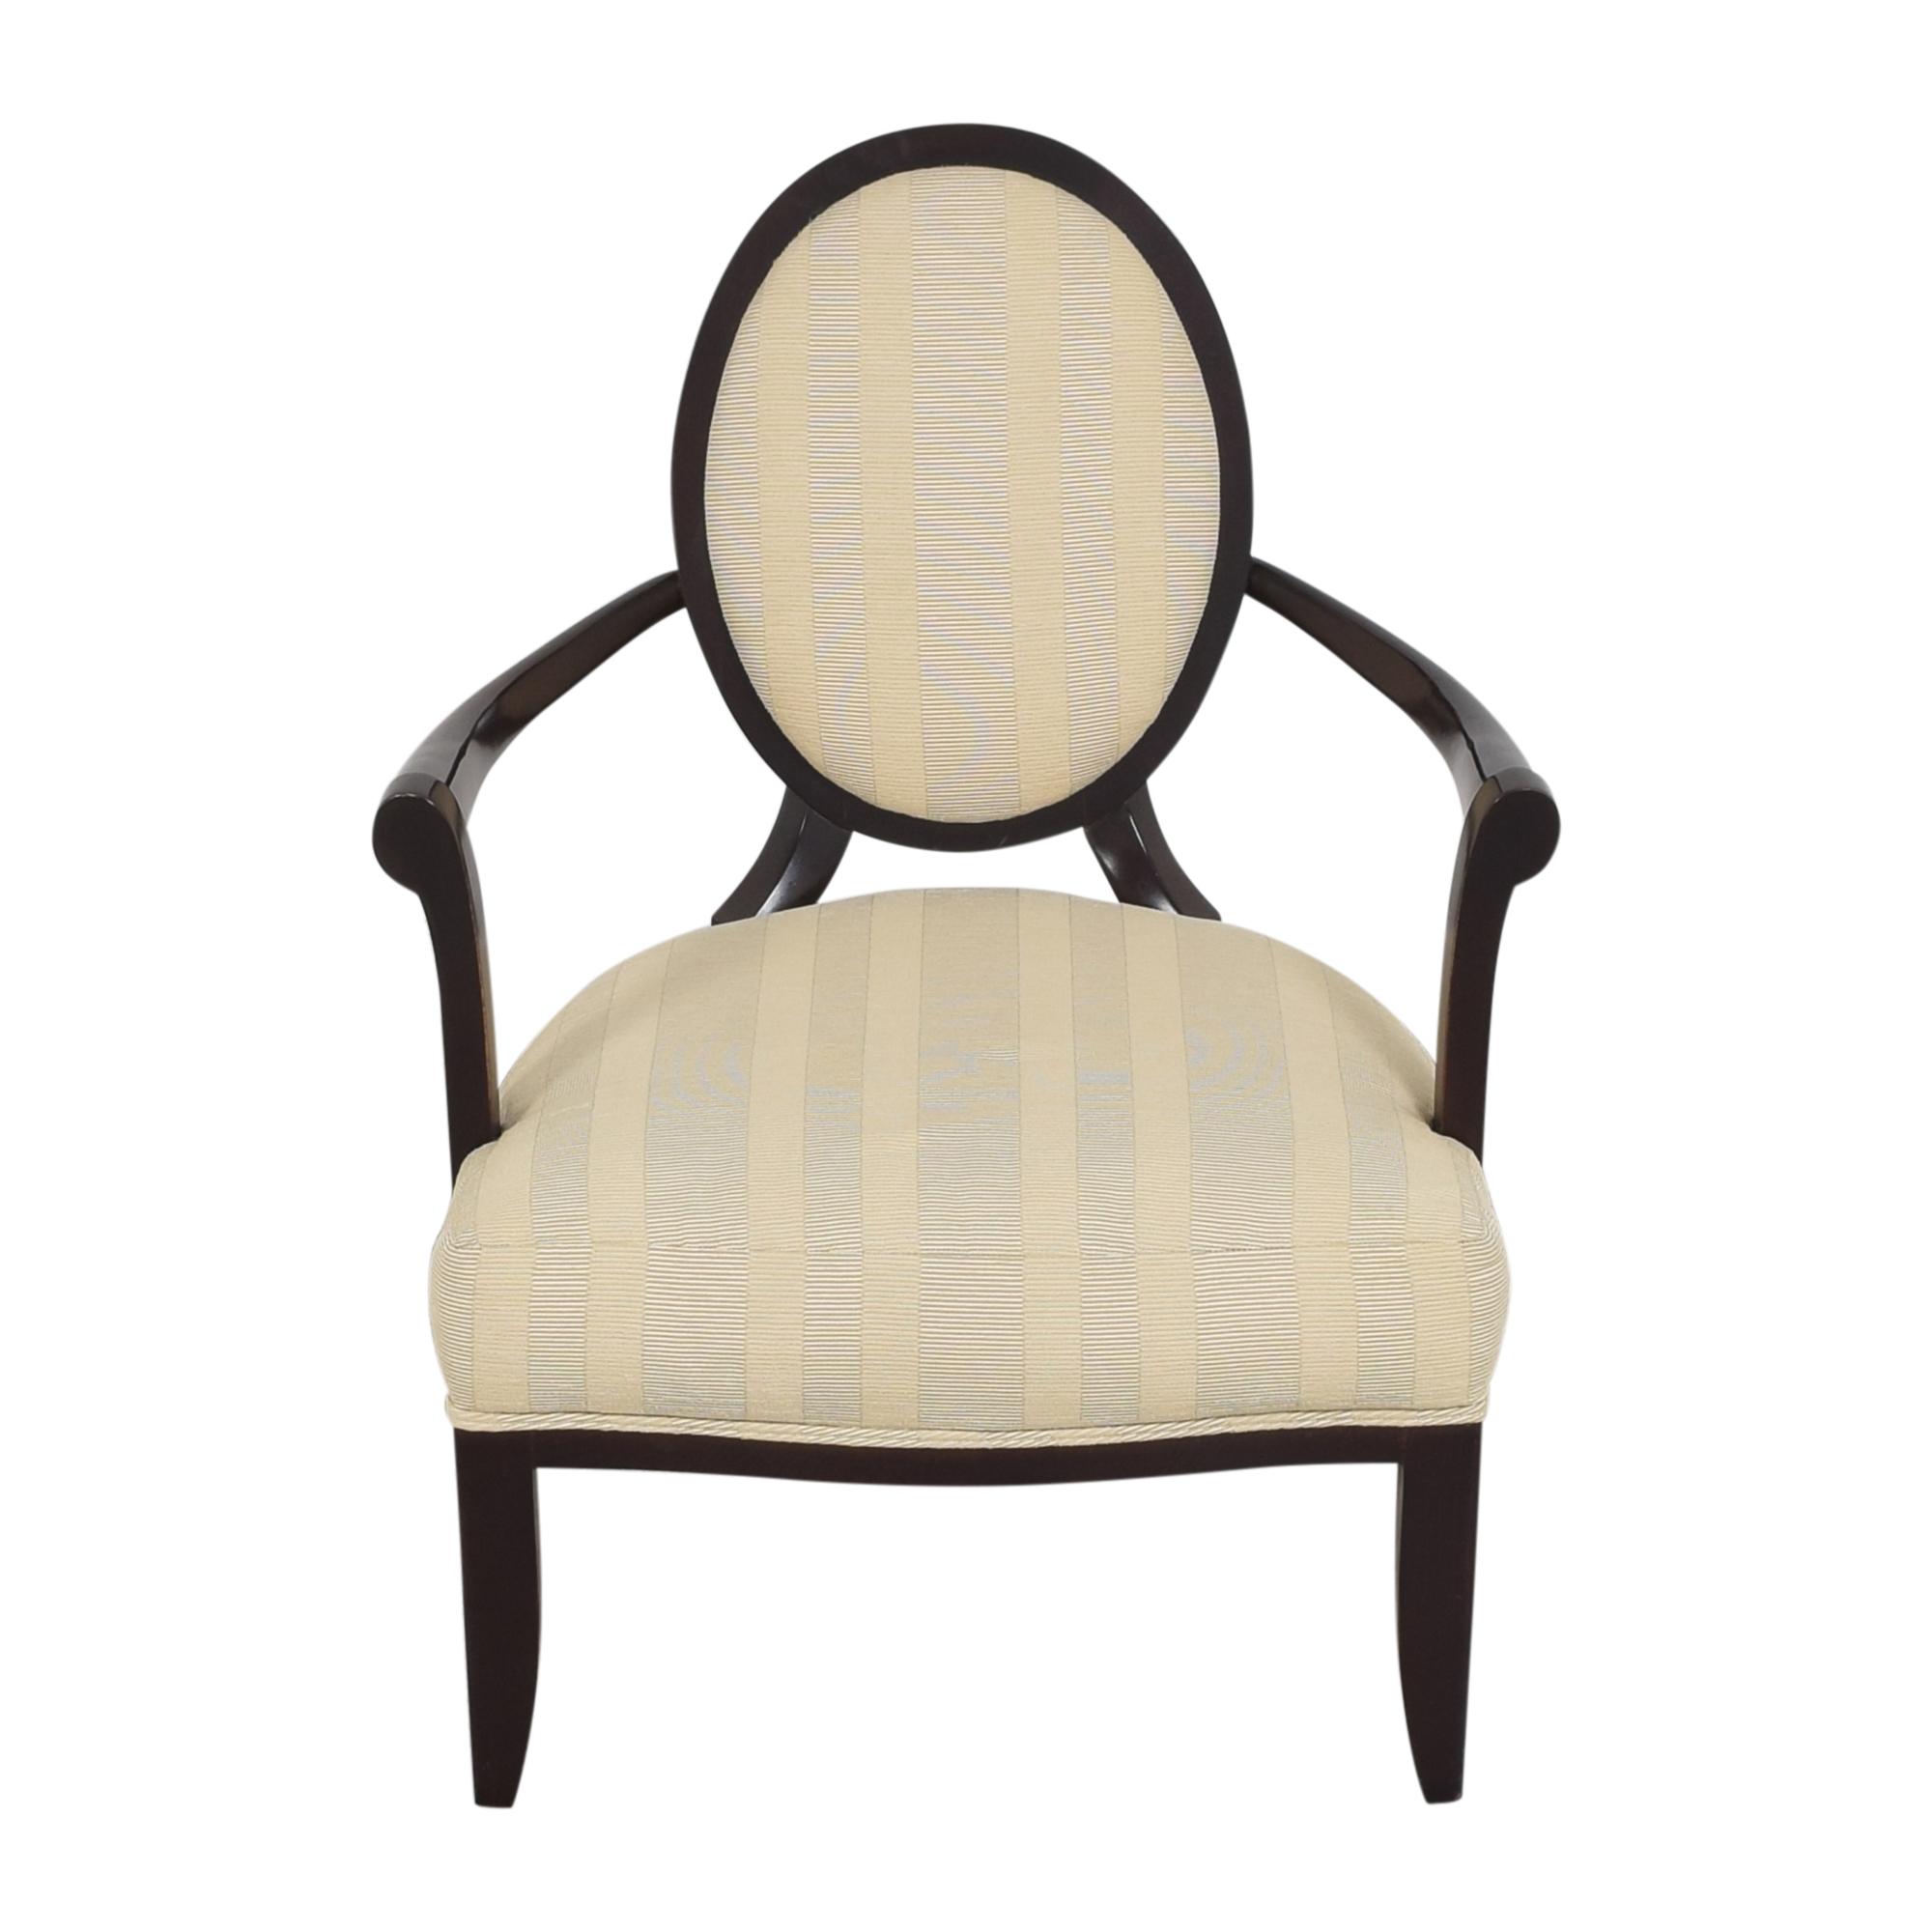 Baker Furniture Barbara Barry for Baker Furniture Oval X Back Armchair ct